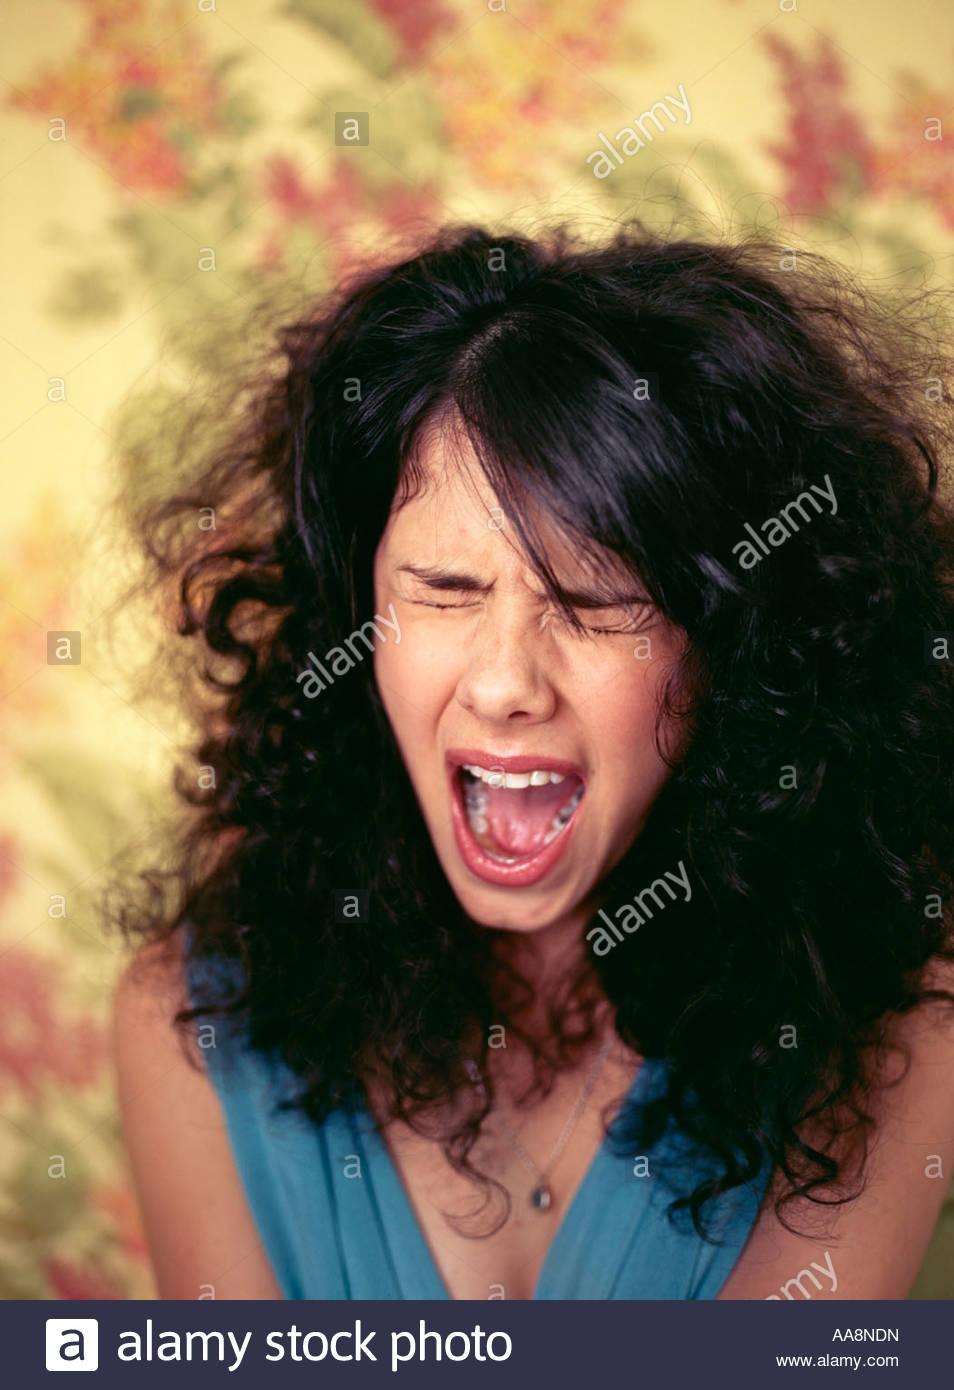 Hispanic woman shouting - Stock Image